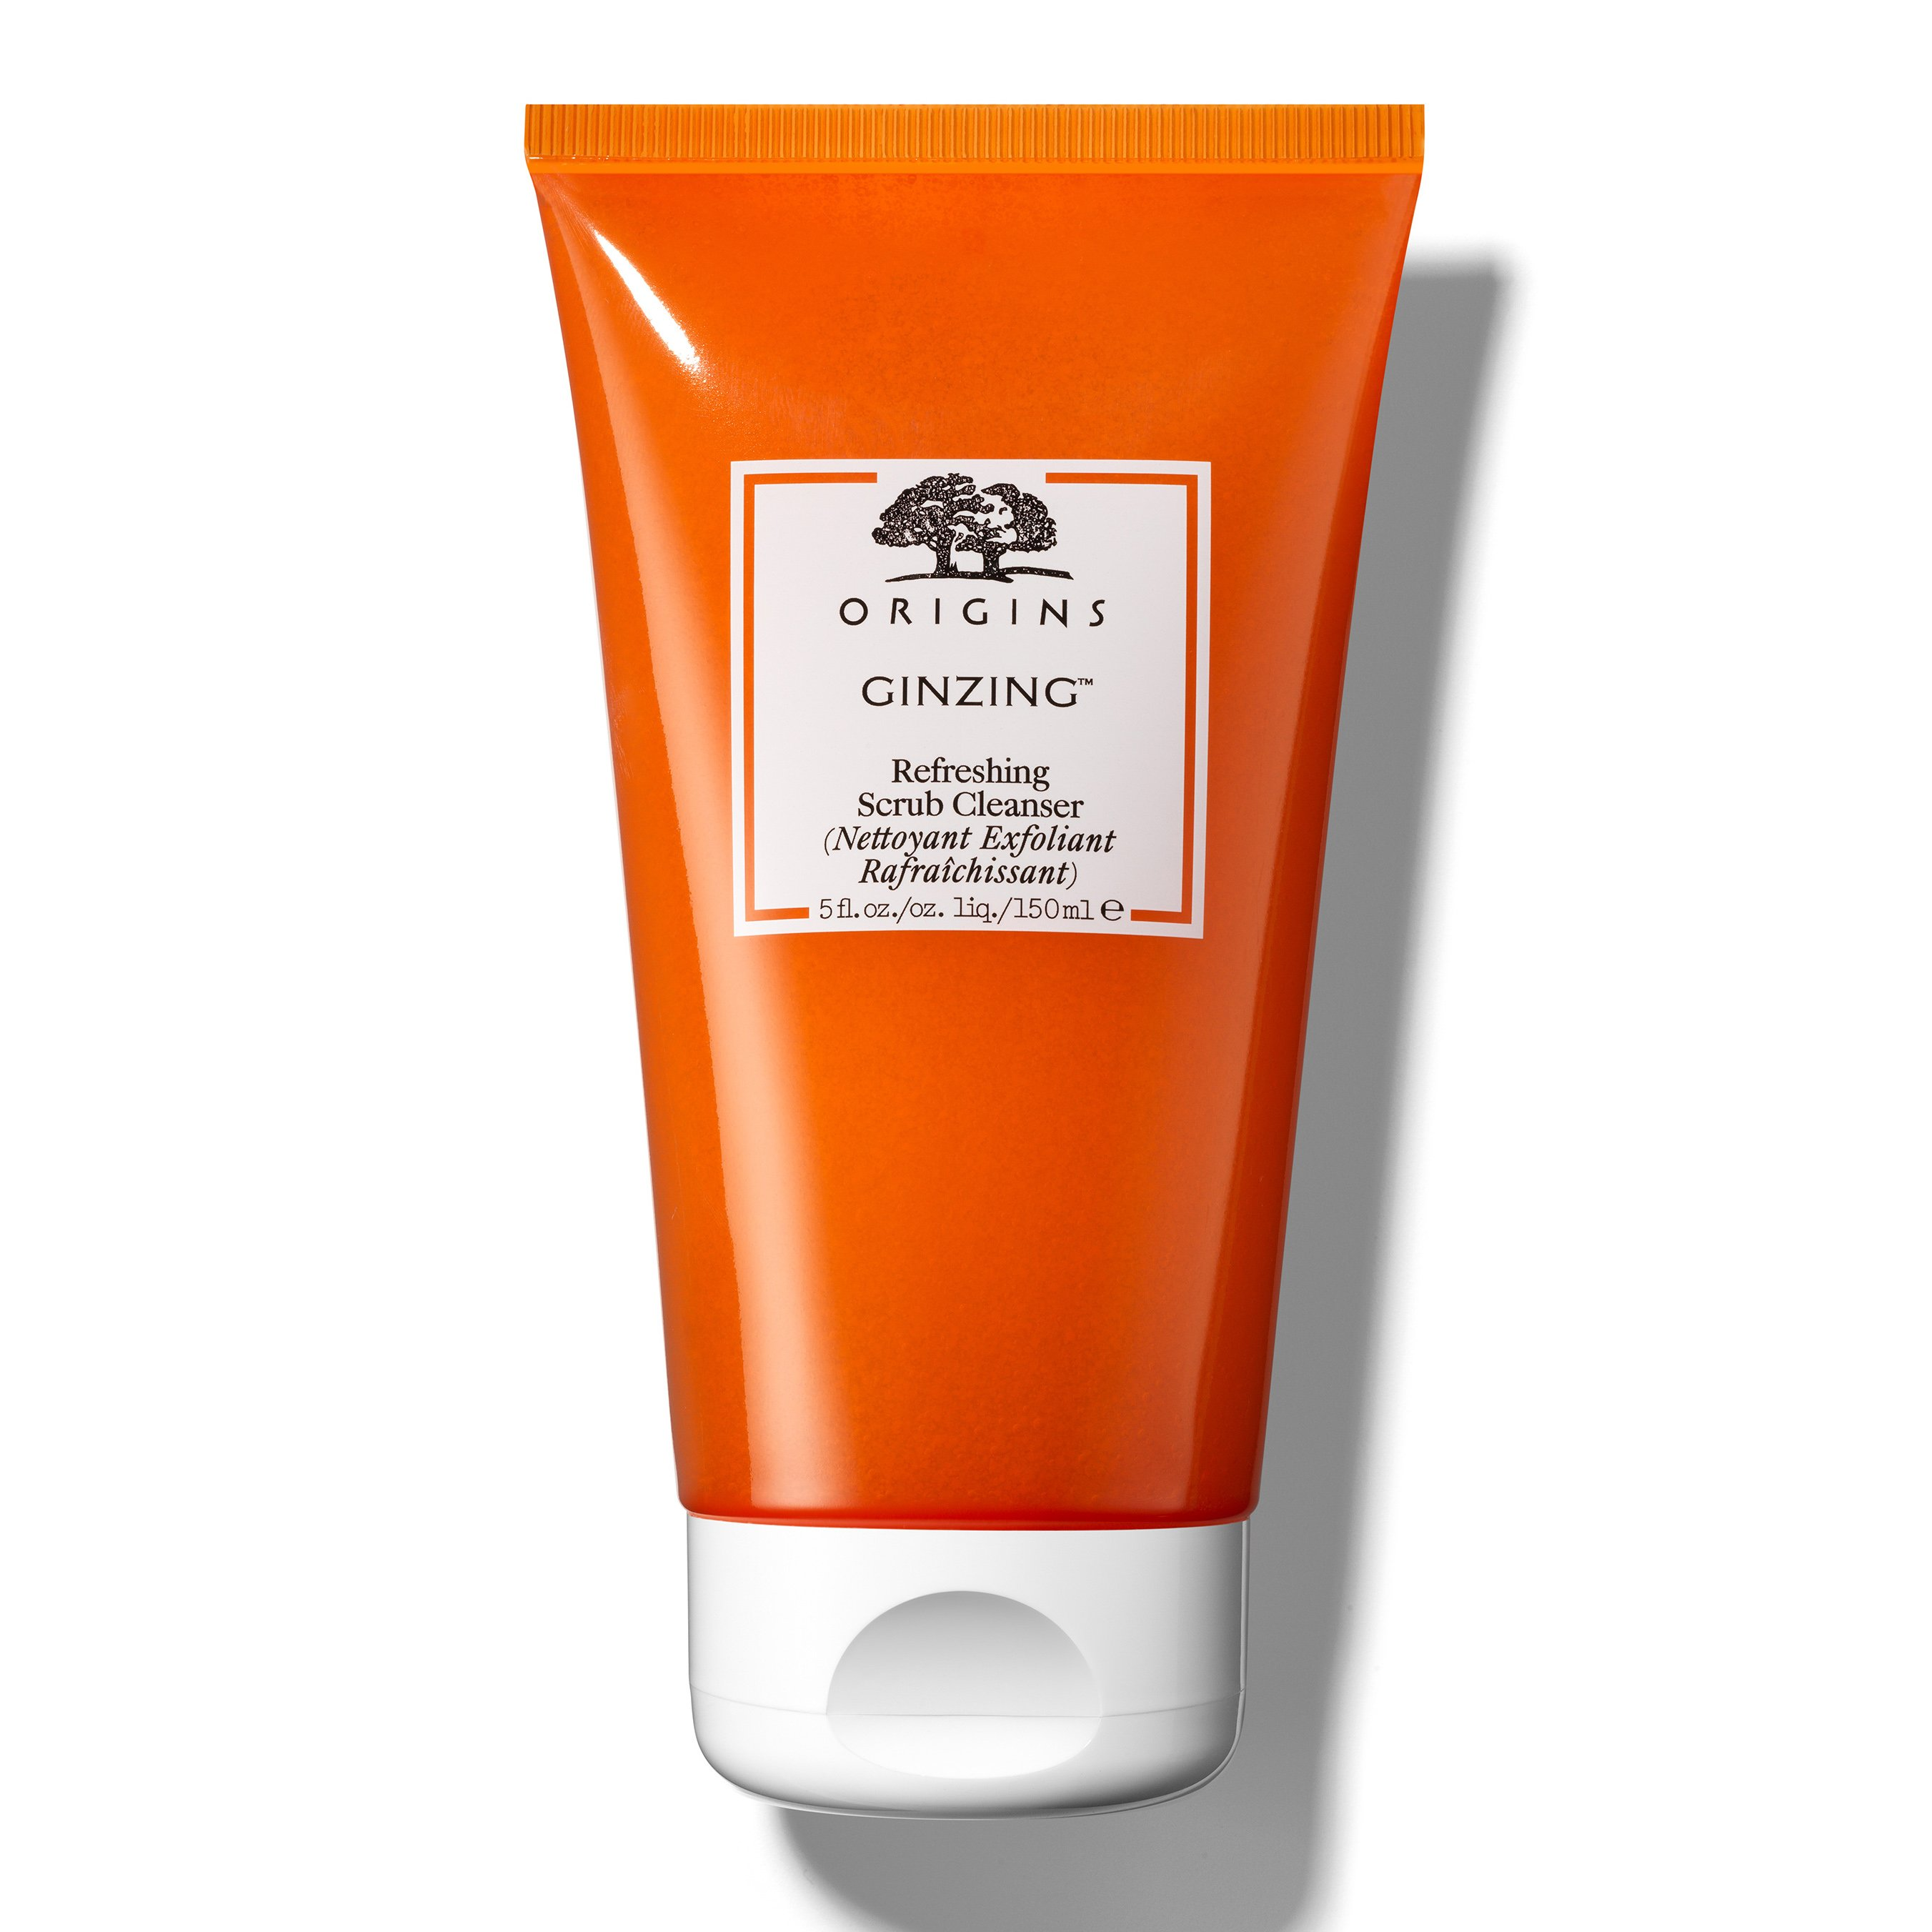 Origins Ginzing Refreshing Scrub Cleanser Αναζωογονητικό Καθαριστικό με Κόκκους Απολέπισης για Απαλή Επιδερμίδα 150ml